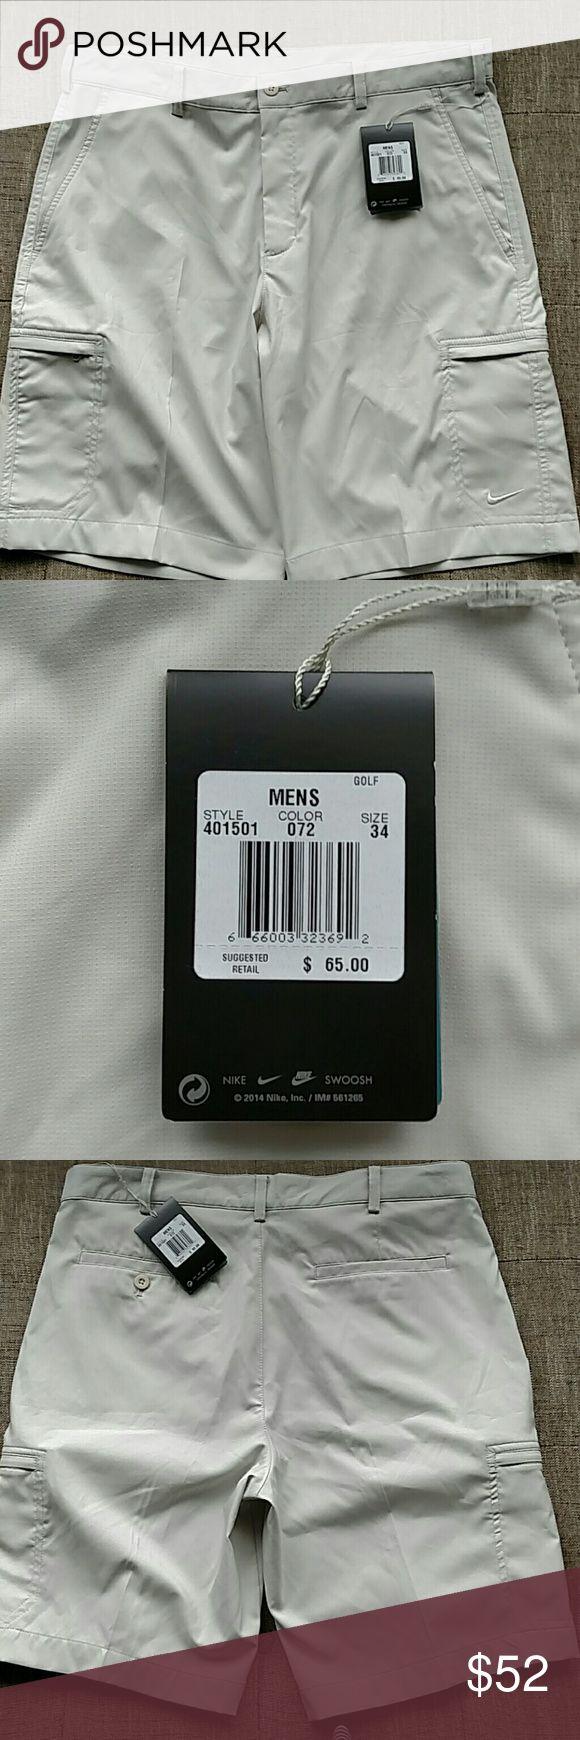 NWT NIKE ATHLETIC SHORTS NEW Nike GOLF Men's Shorts Size 34 Style:   401501 Color:.  072 Nike Shorts Athletic